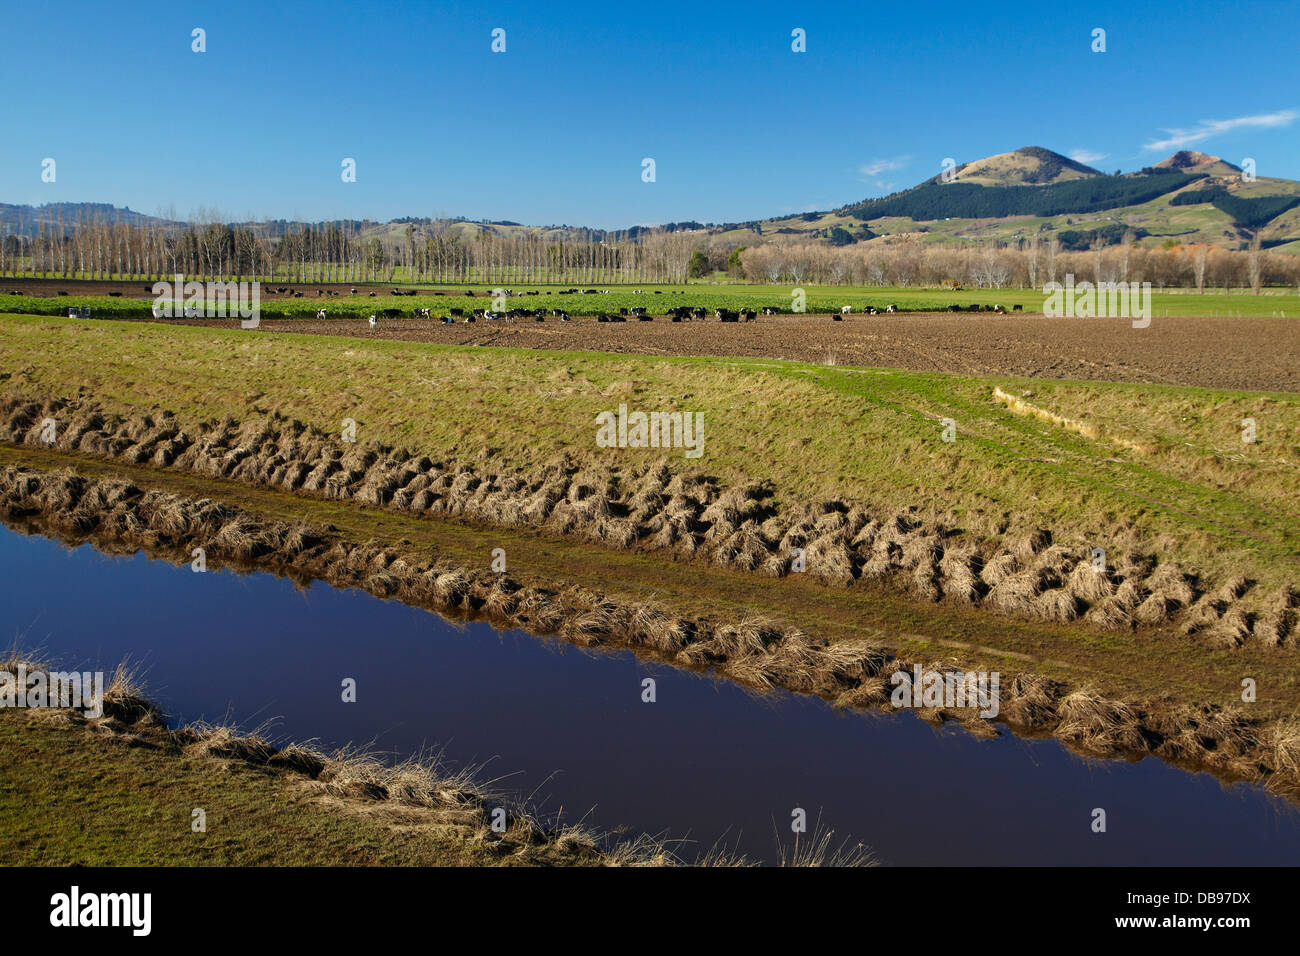 Silver Stream and flood banks, Taieri Plains, near Dunedin, South Island, New Zealand Stock Photo